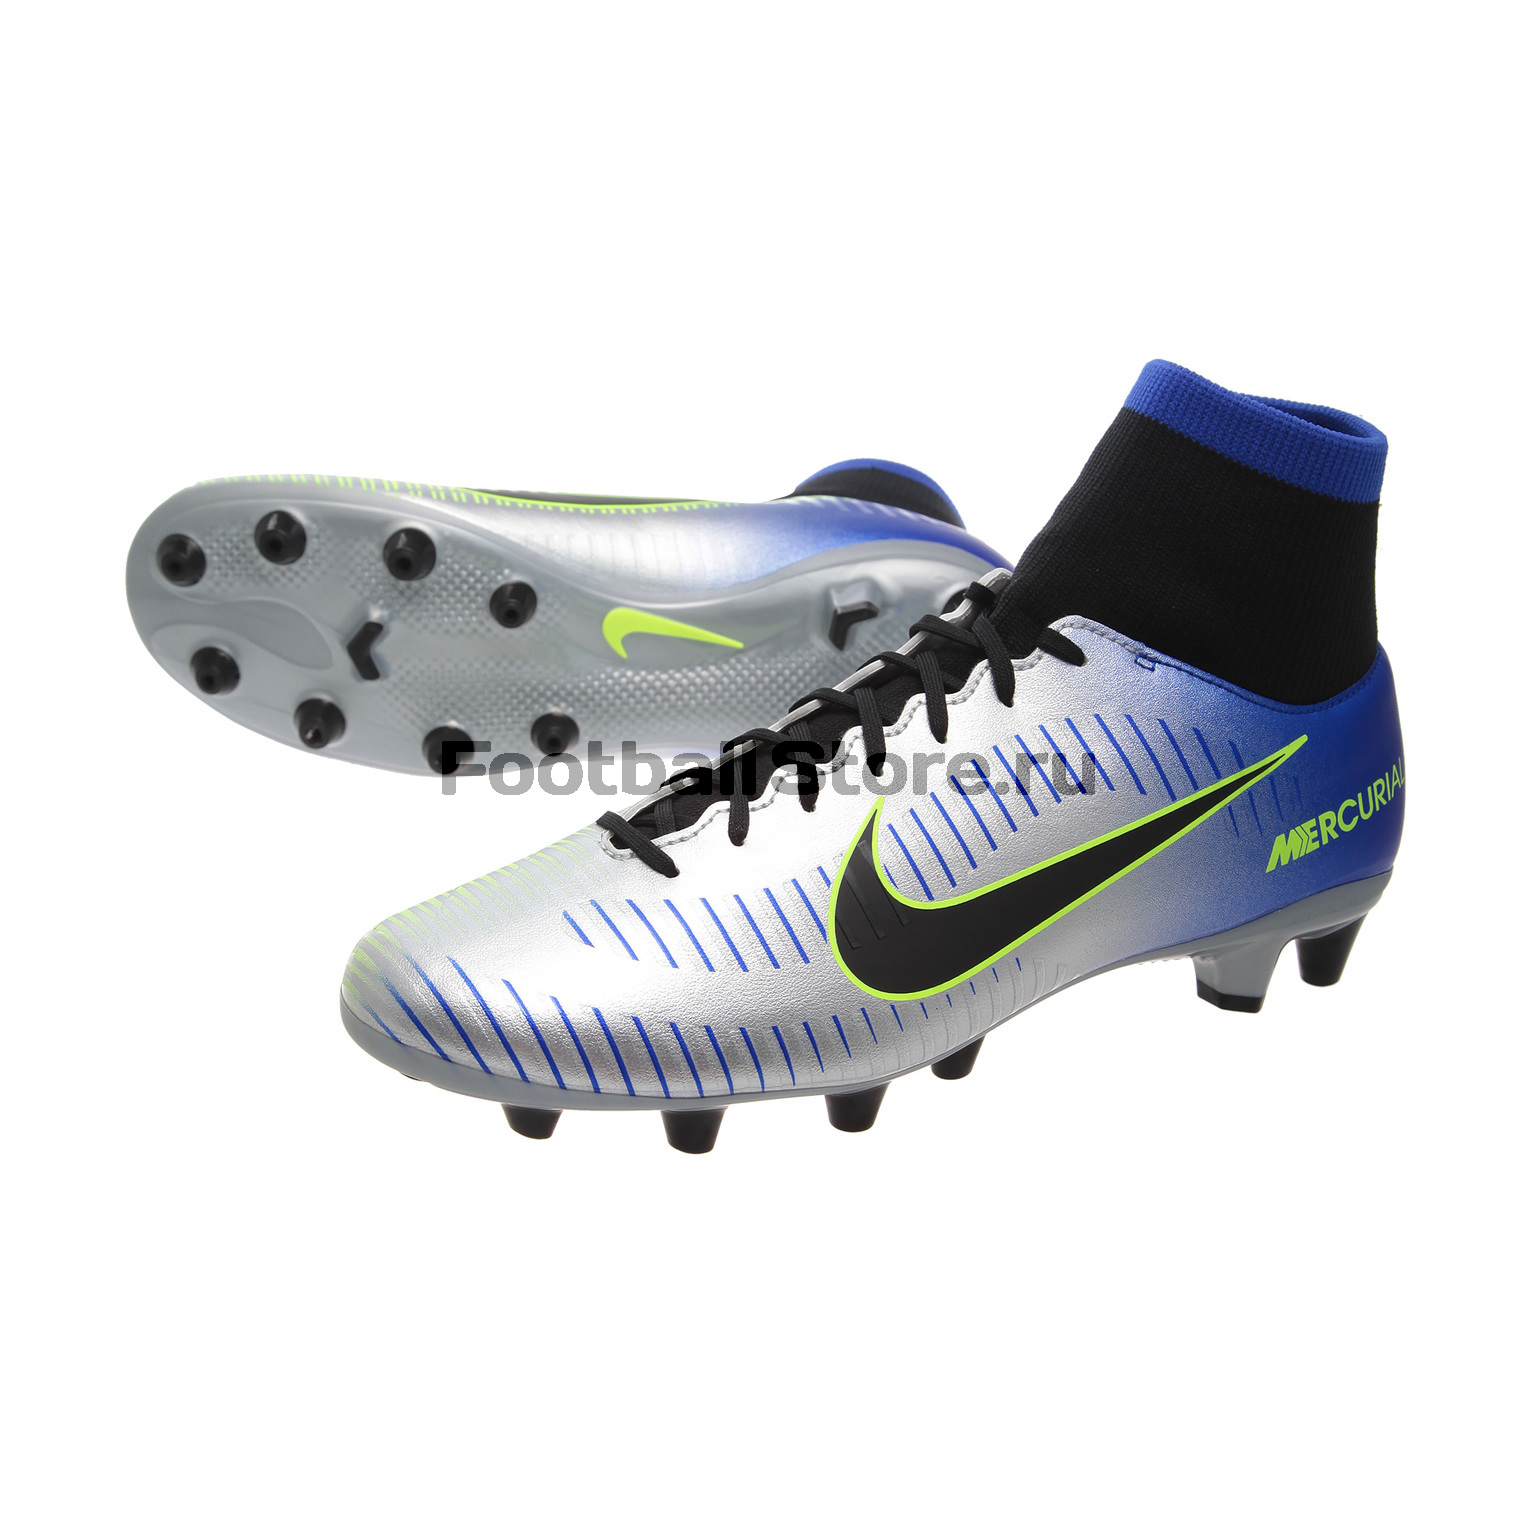 Бутсы Nike Mercurial Victory Neymar AG-Pro 921503-407 бутсы футбольные nike mercurial victory vi njr fg 921488 407 jr детские